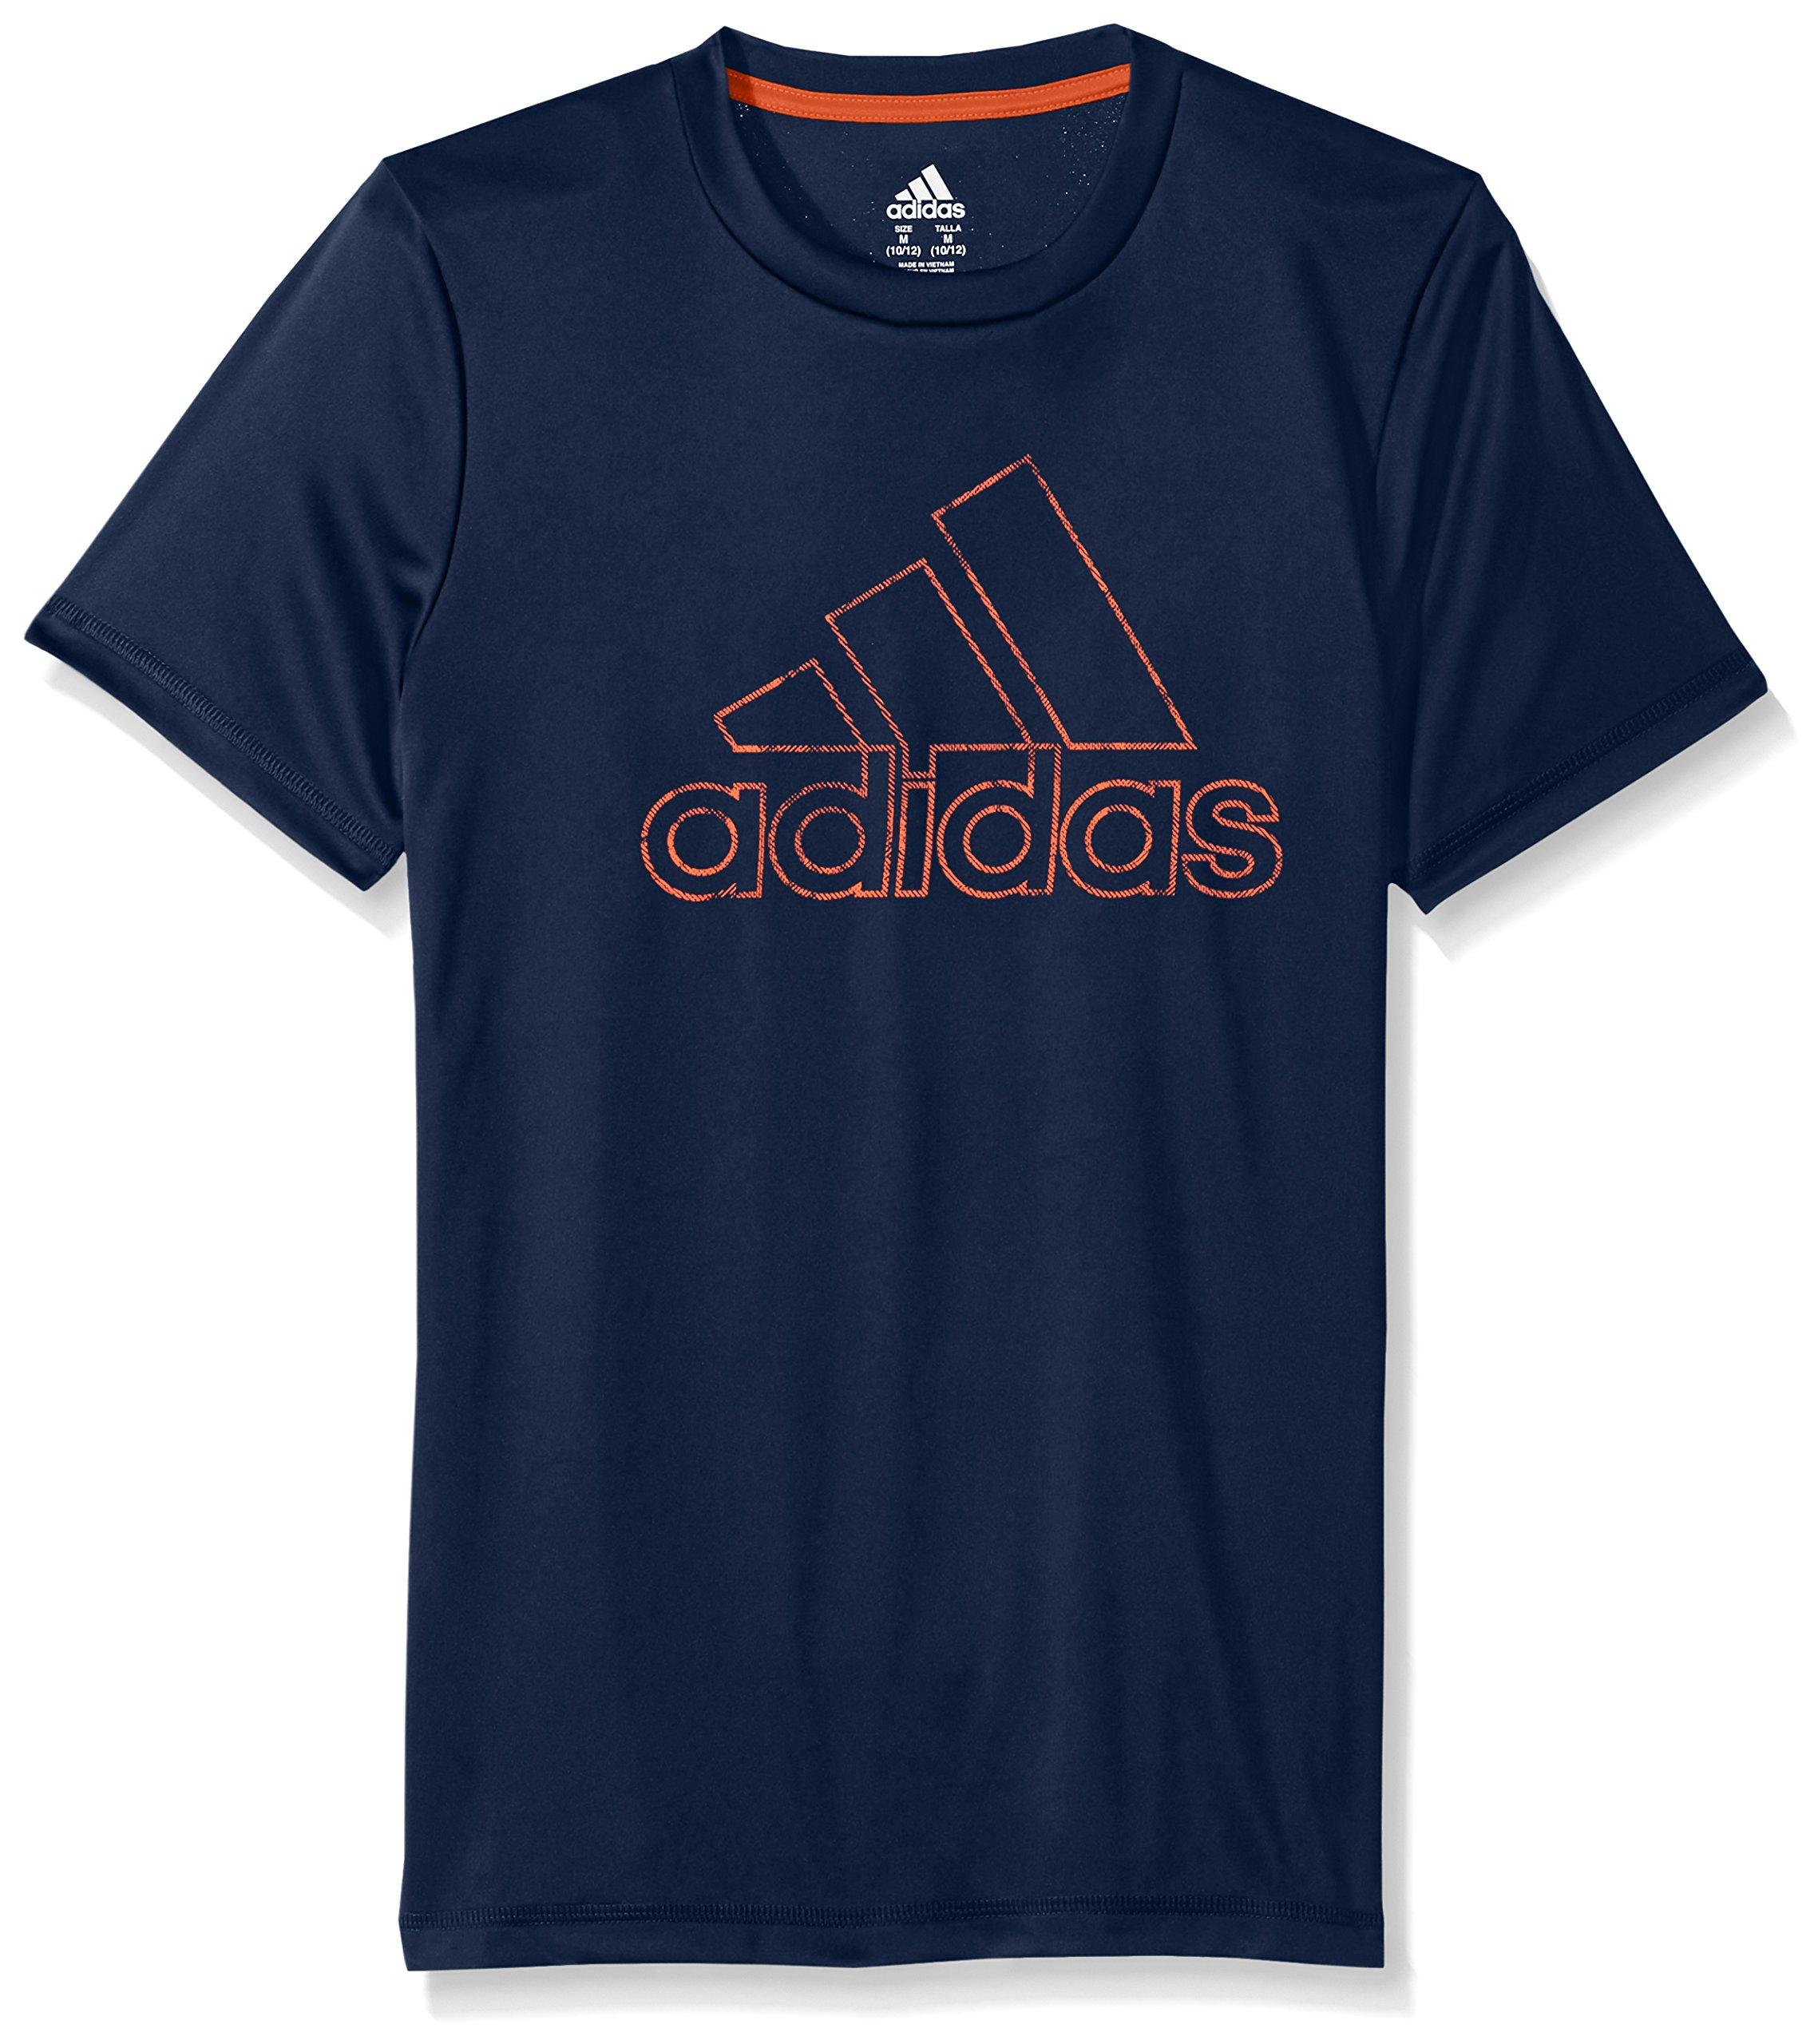 adidas Little Boys' Short Sleeve Logo Tee Shirt, Collegiate Blue, 6